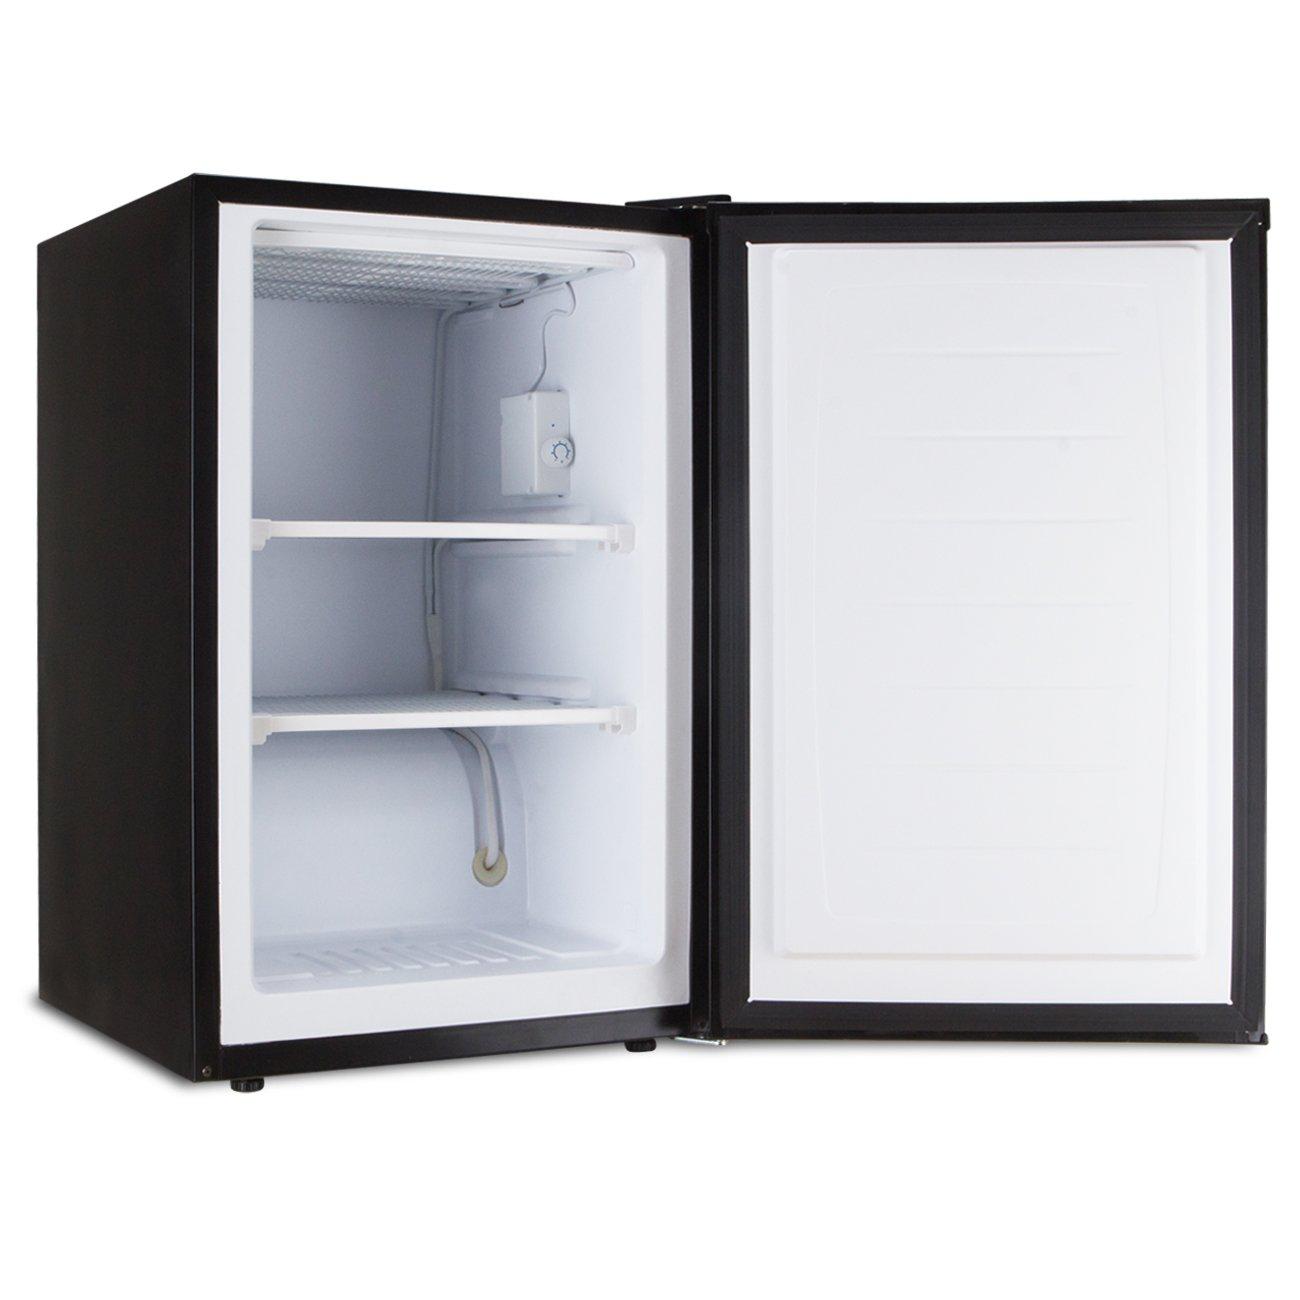 Midea stainless steel compact single reversible door upright freezers - Amazon Com Della Compact Freezer Upright Single Reversible Door 3 0 Cubic Feet Black Home Improvement